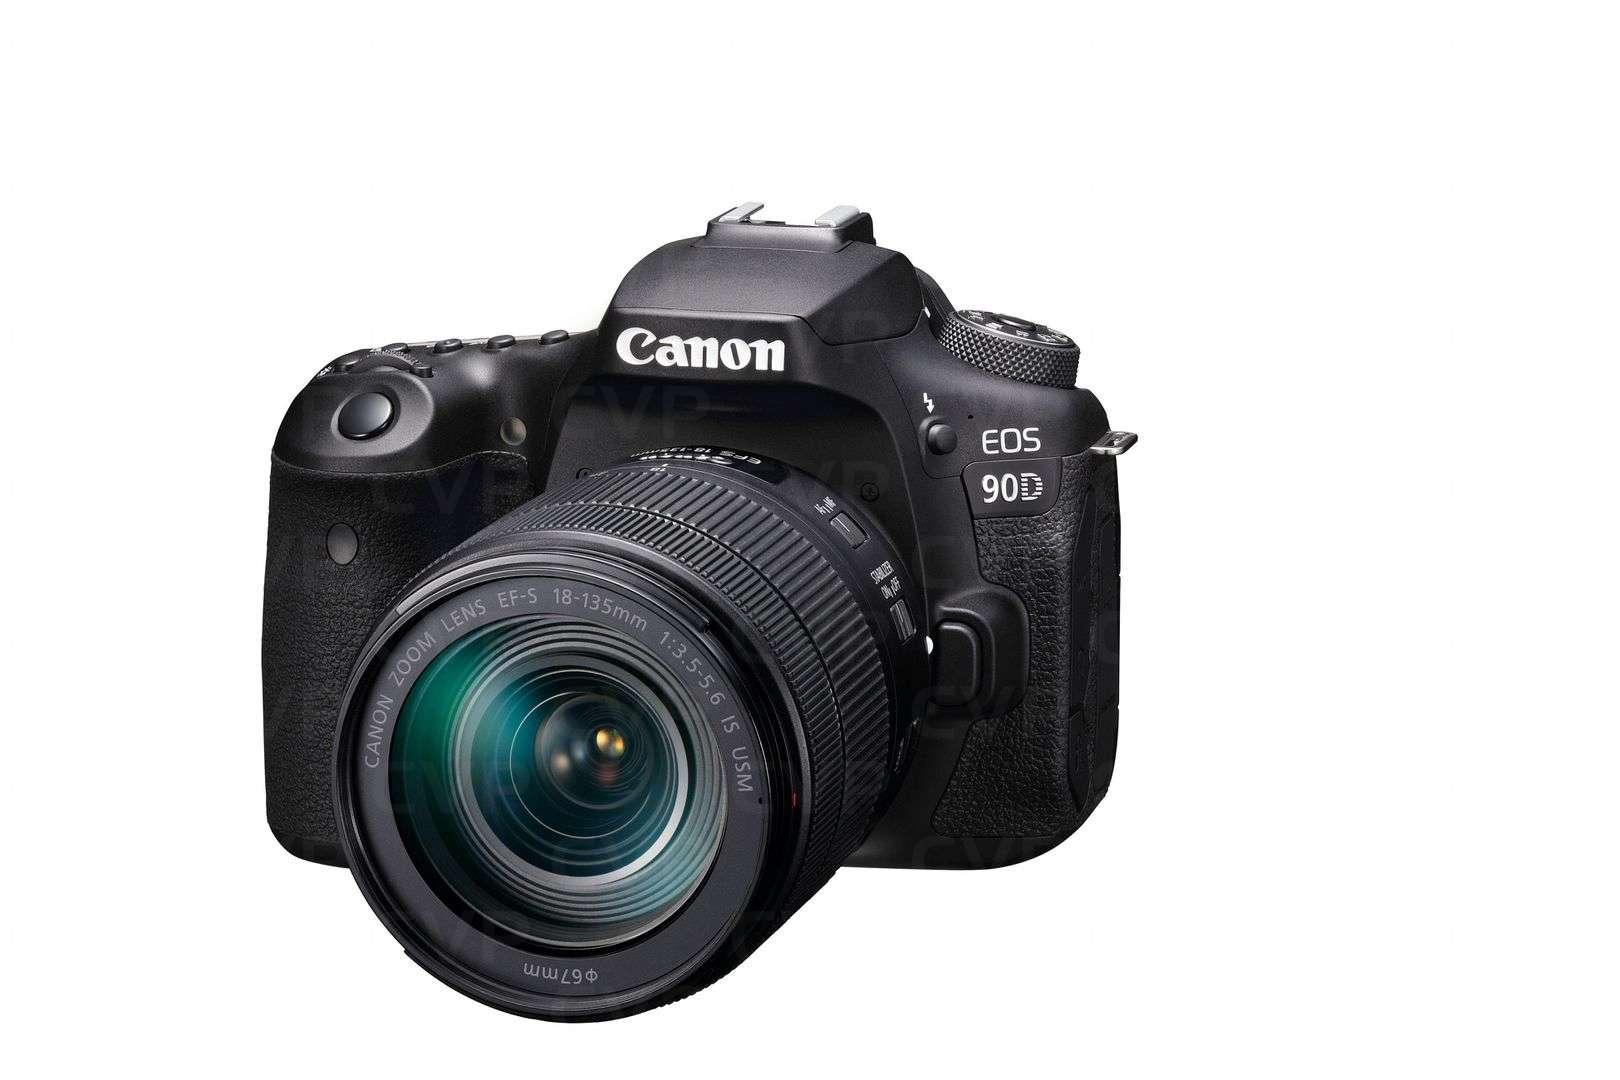 Canon EOS 90D + 18-135mm Lens